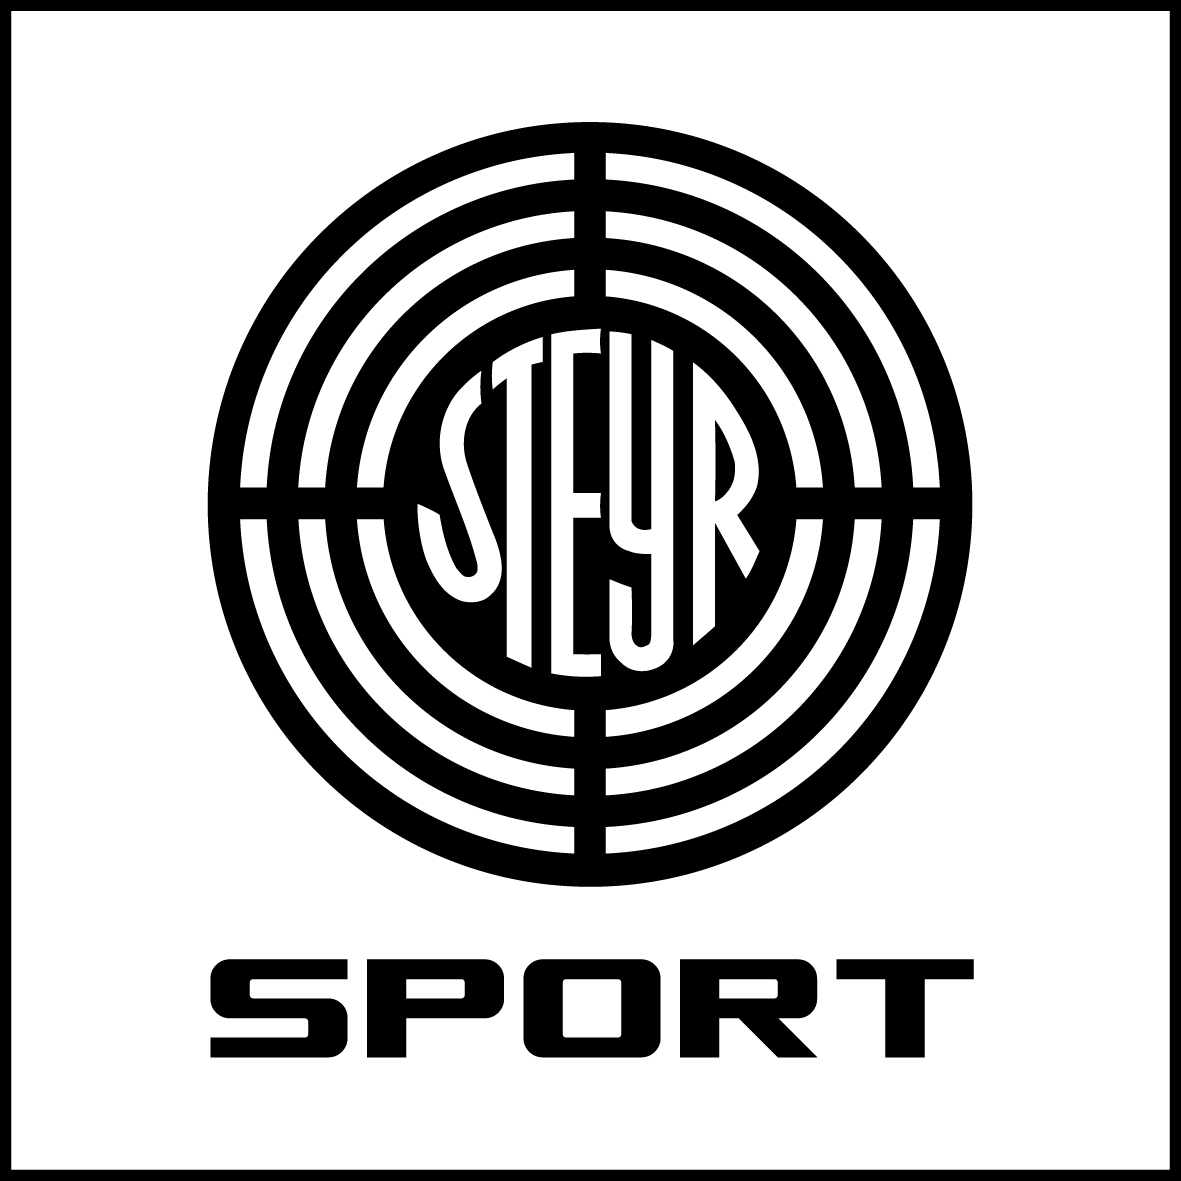 steyr-sport-logo